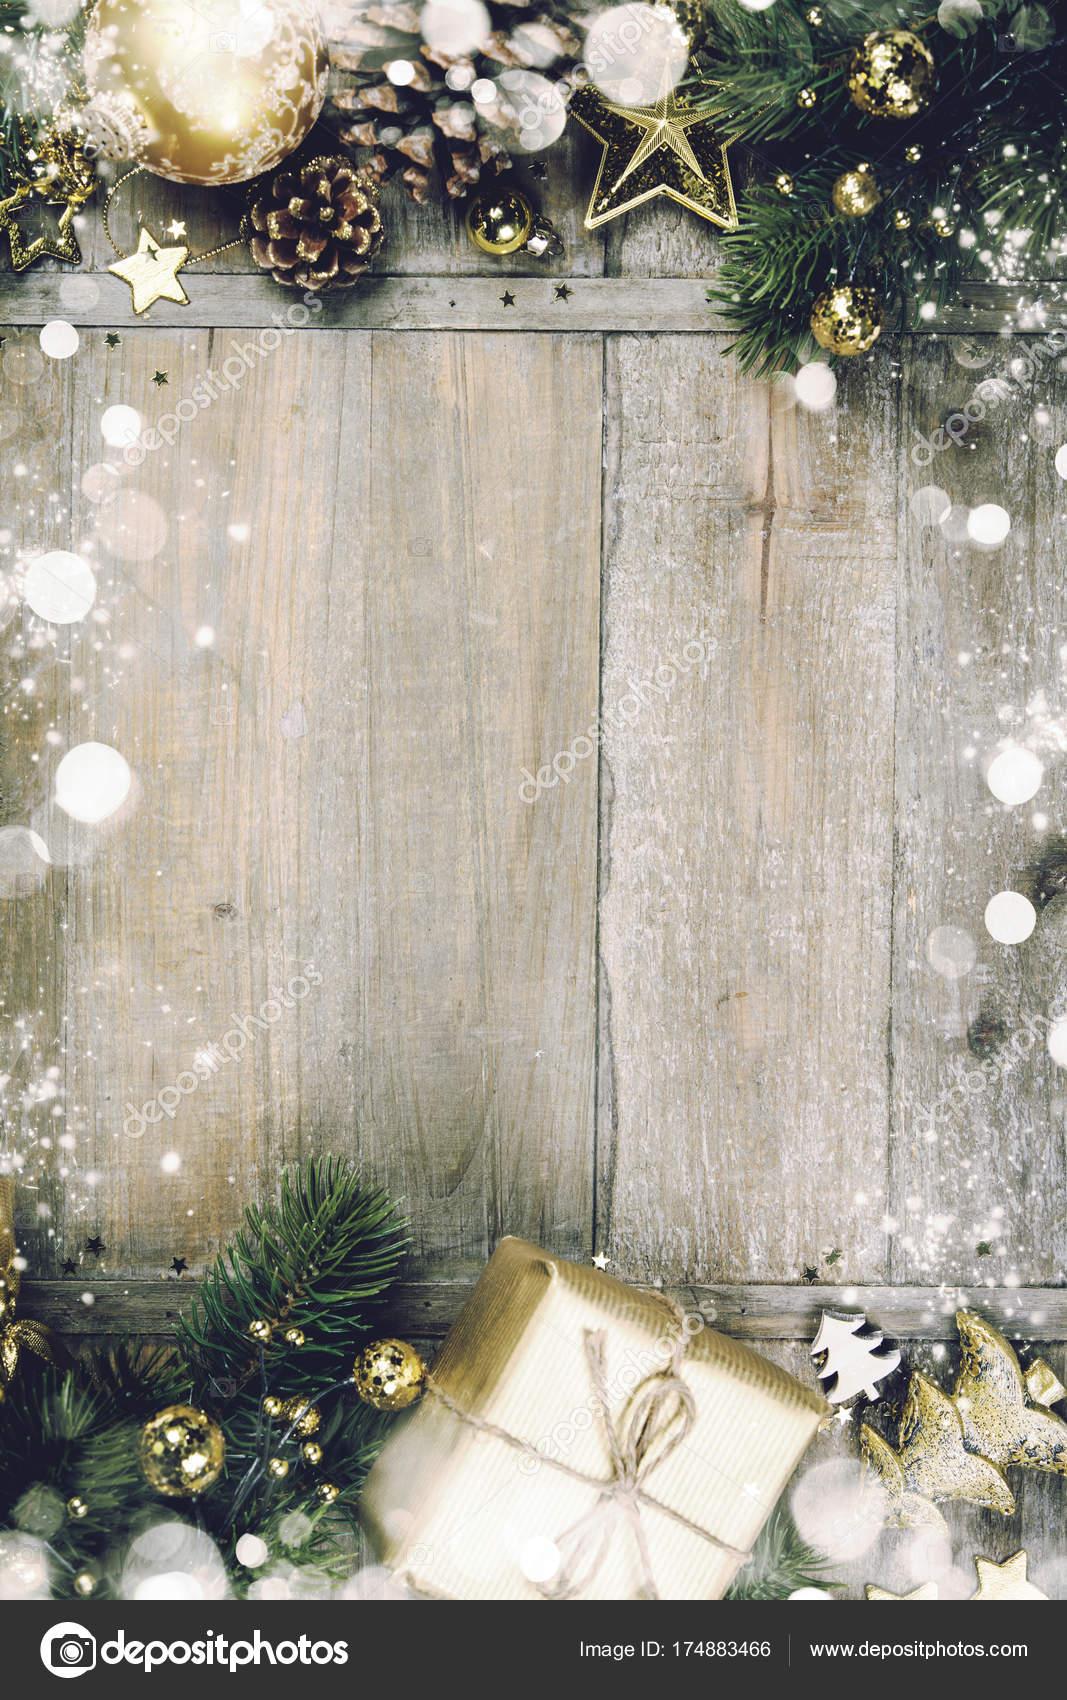 depositphotos 174883466 stock photo christmas theme background in vintage